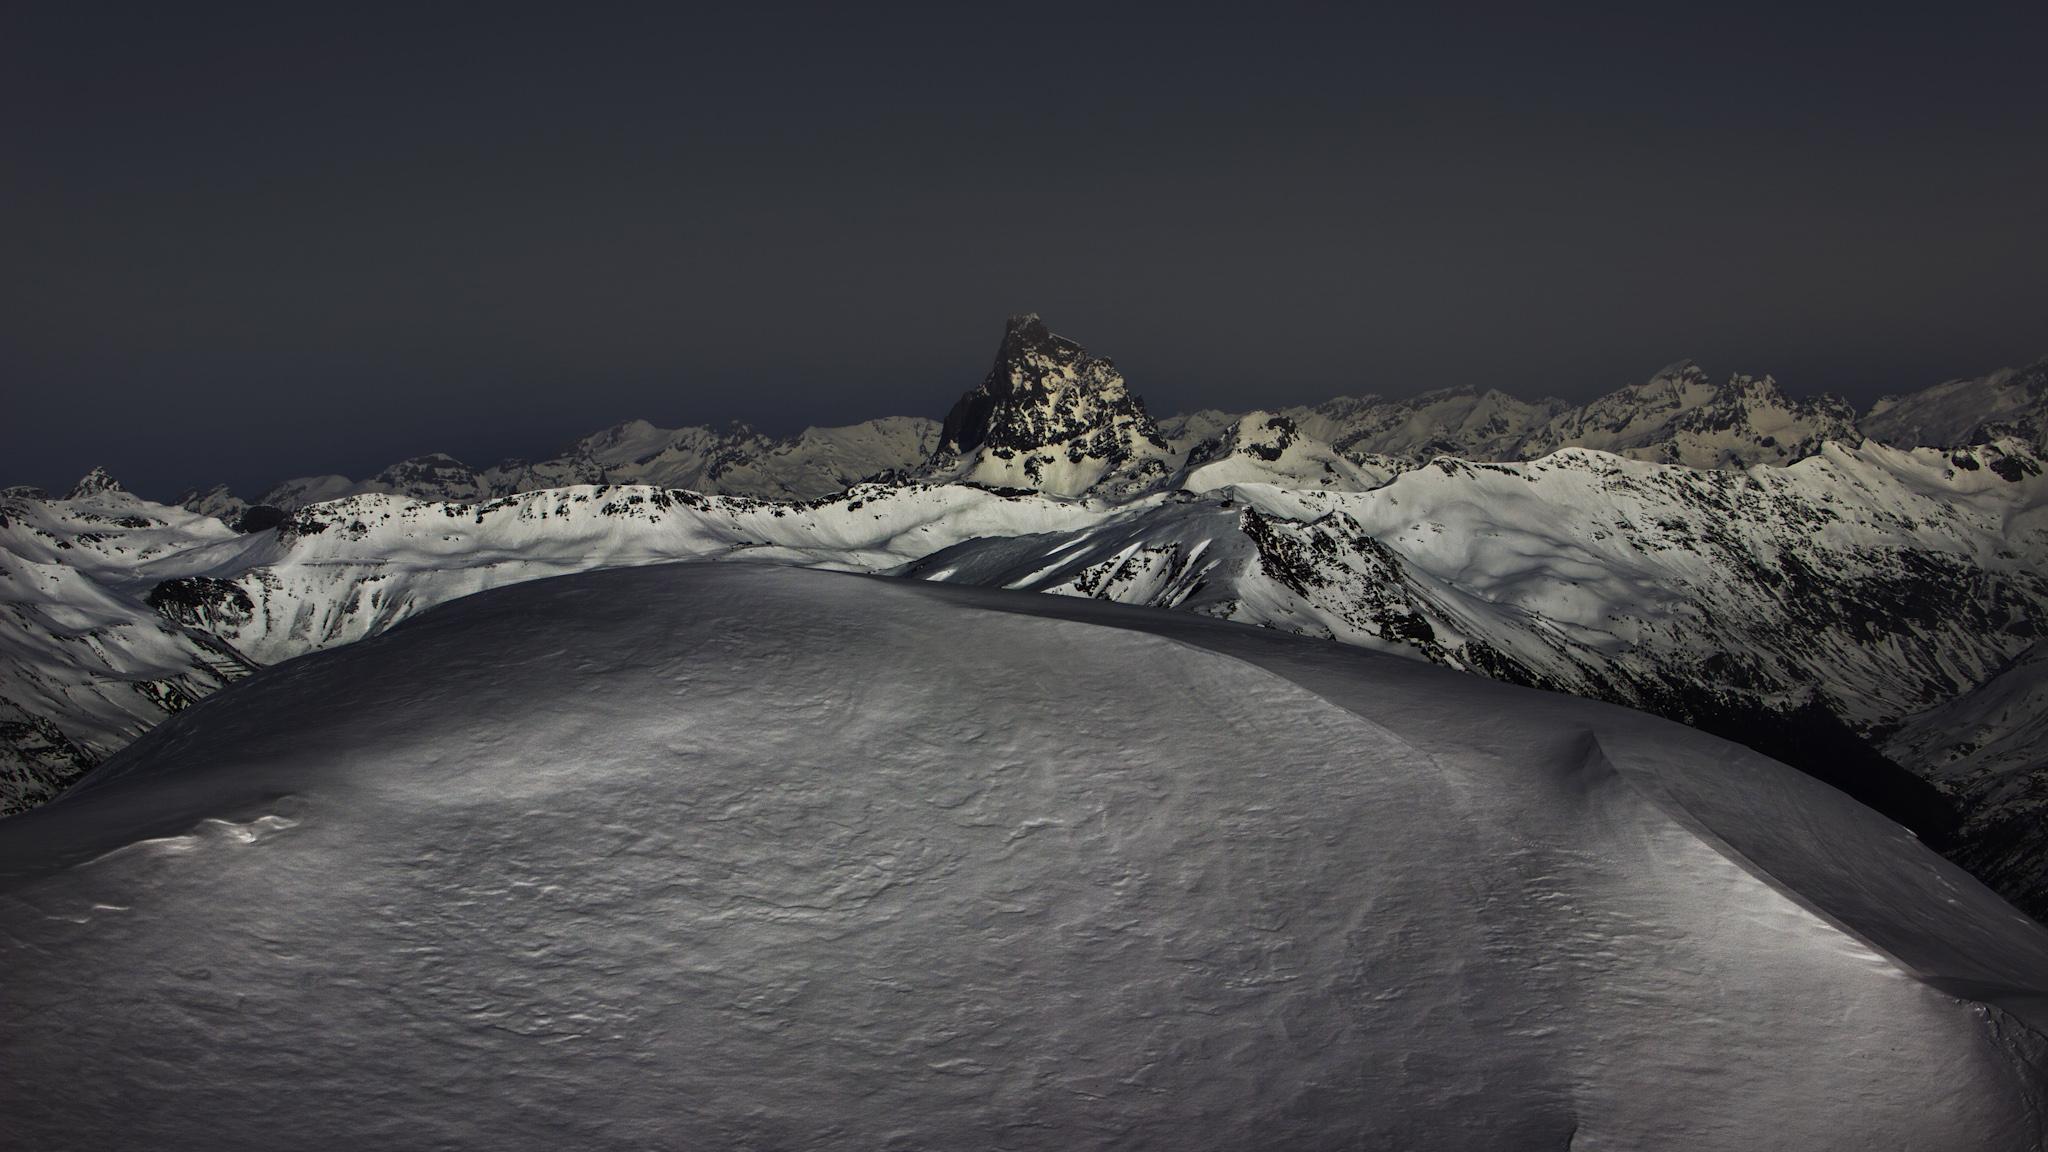 MIdi d'Ossau desde el Corredor de los Navarros - Midi d´Ossau - Fotos del Valle del Aragón, Mikel Besga